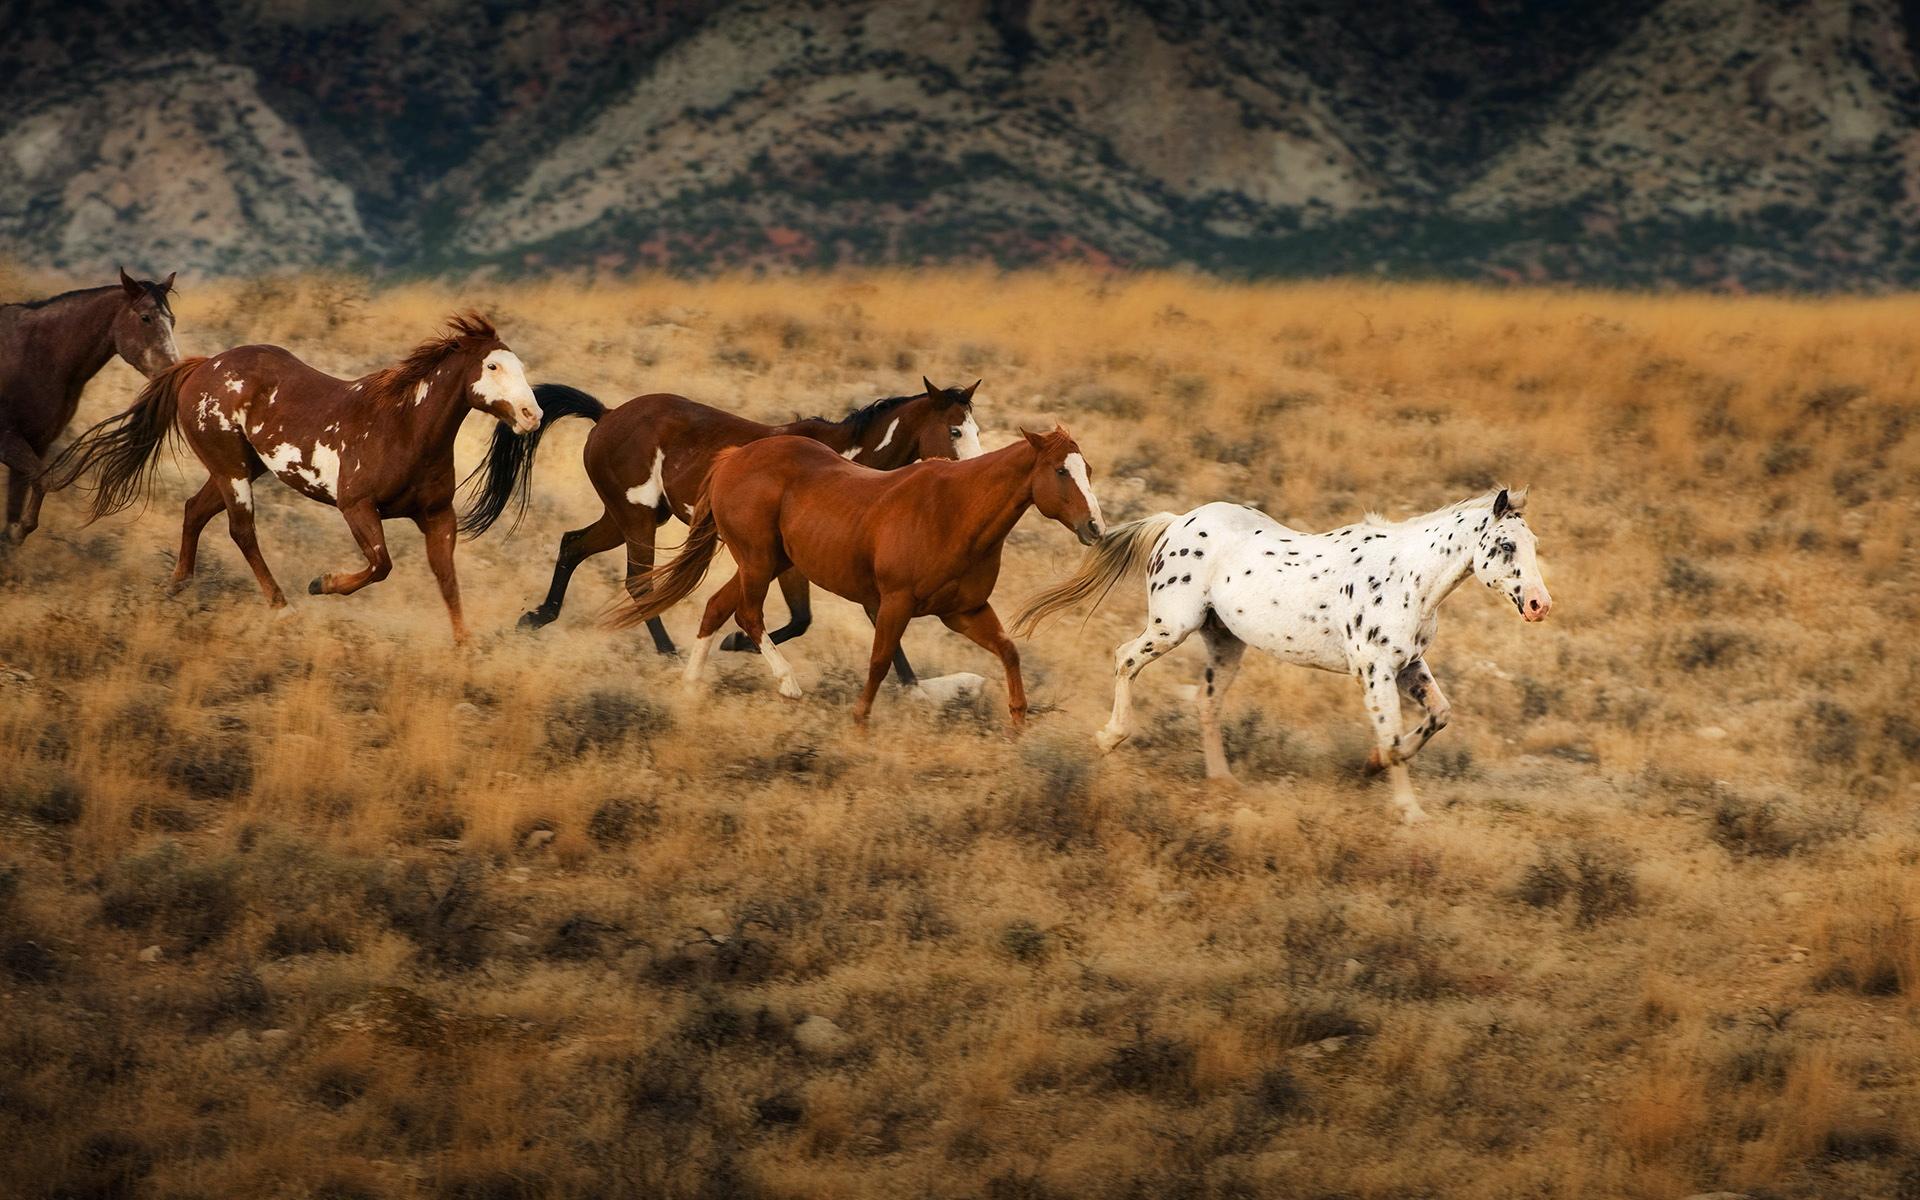 Running Horses Wallpaper Animals HD Wallpapers Desktop 1920x1200